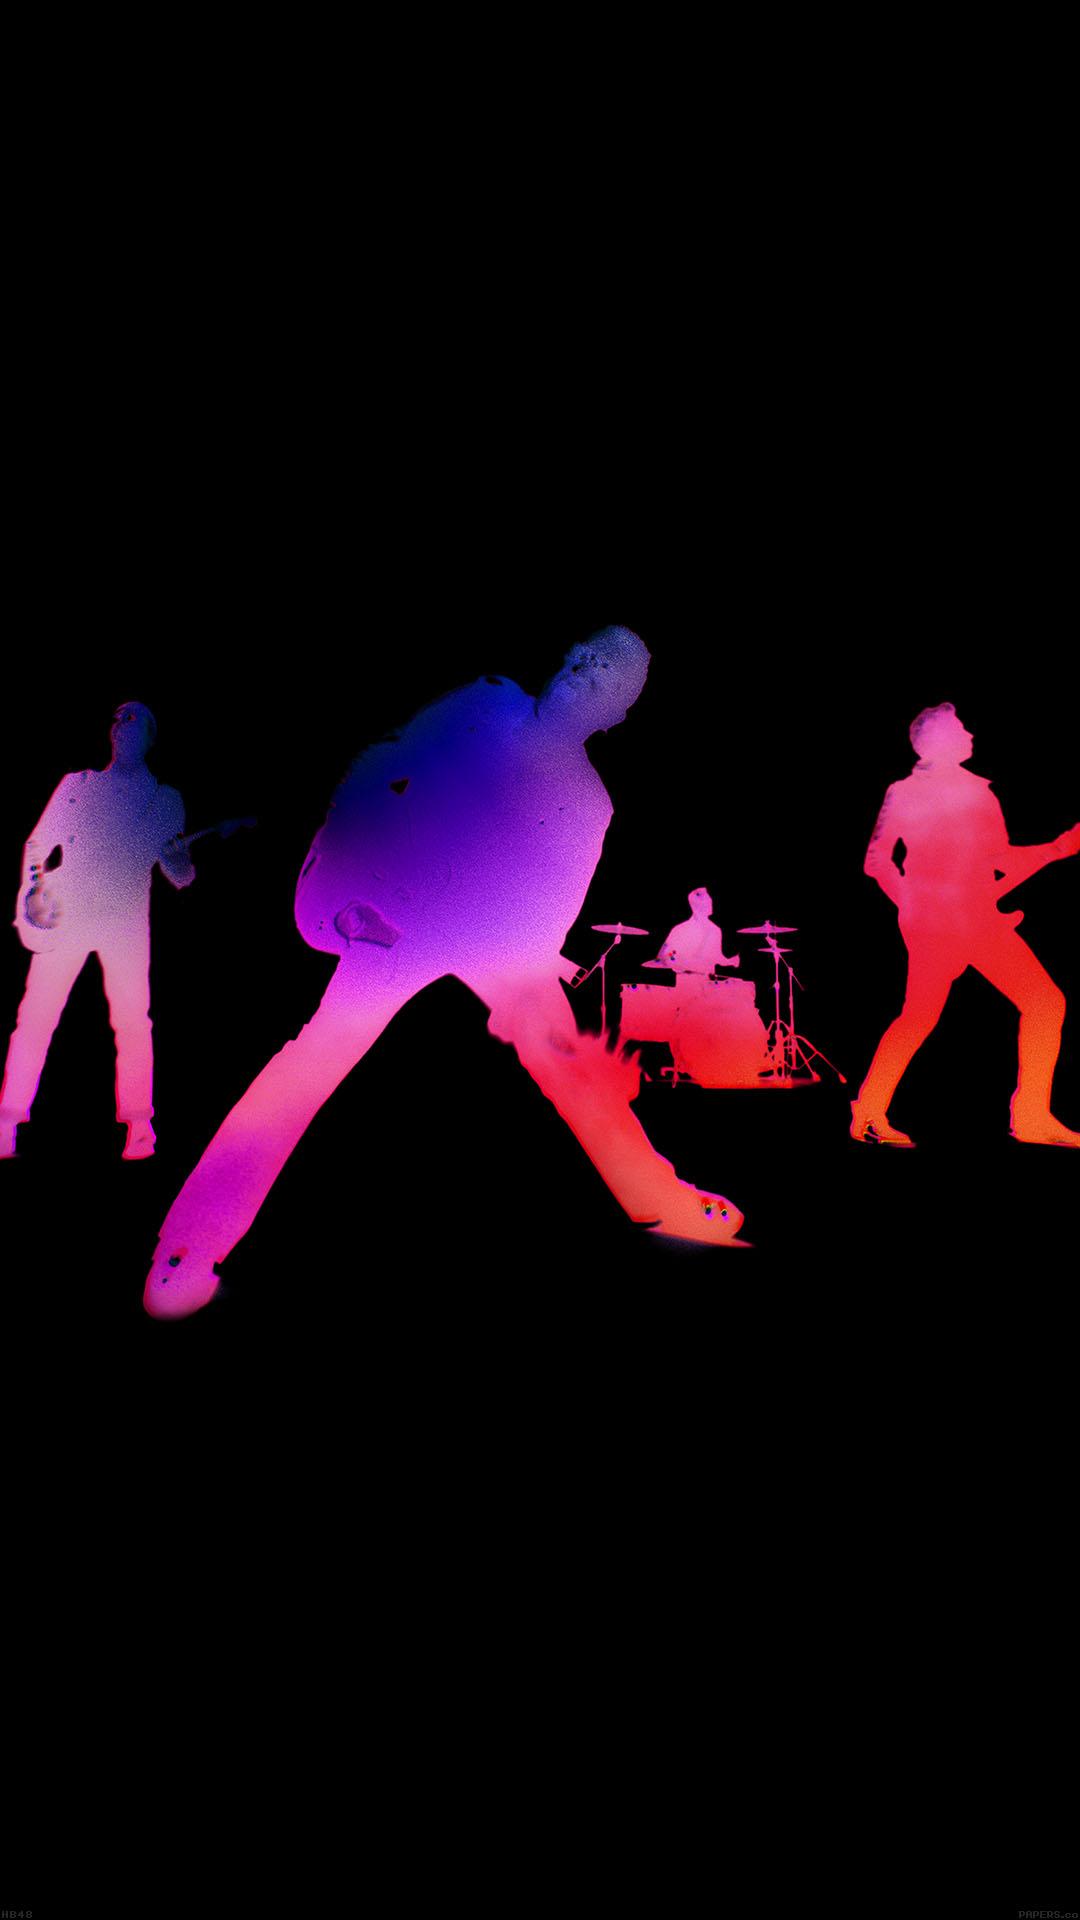 U2 Free Music